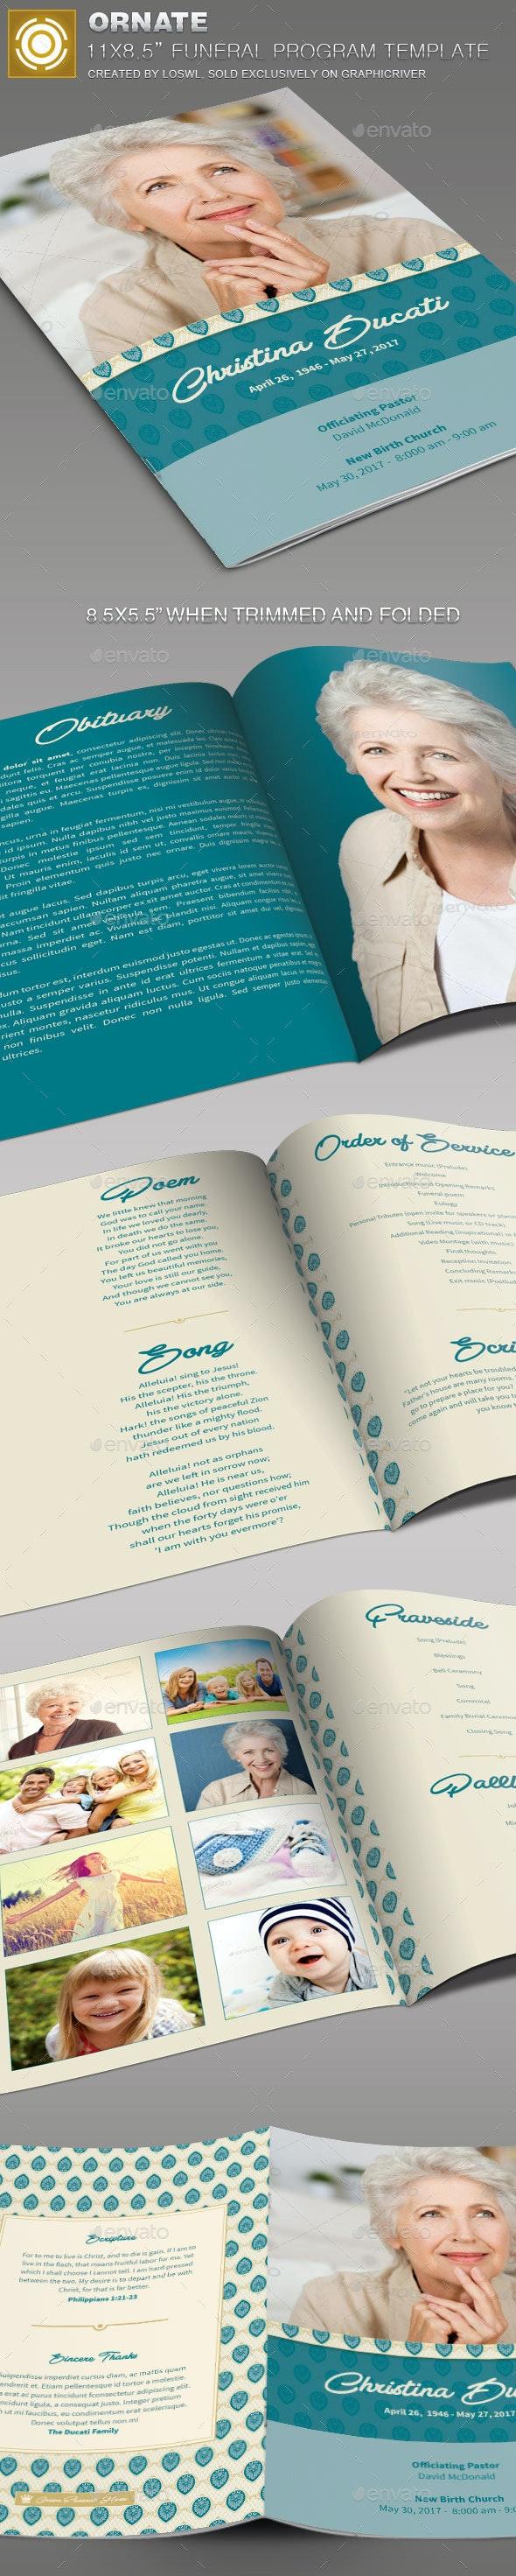 Ornate Funeral Program Template - Informational Brochures